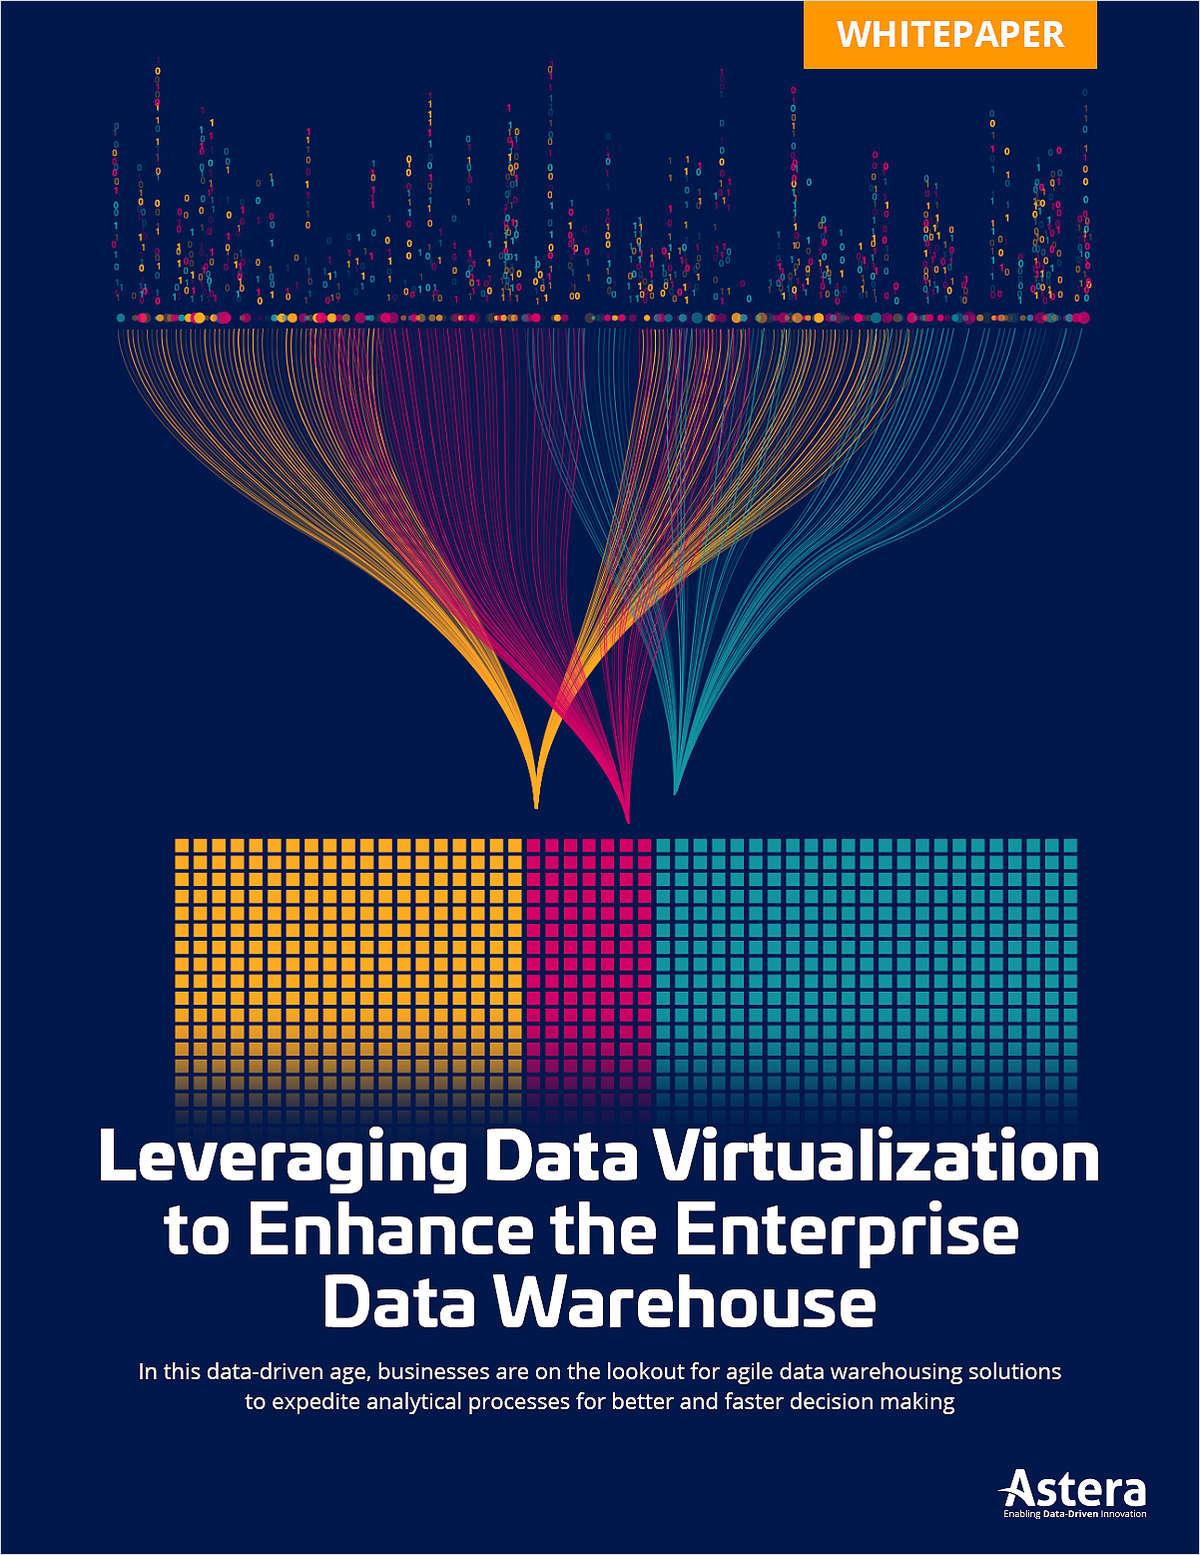 Leveraging Data Virtualization to Enhance the Enterprise Data Warehouse